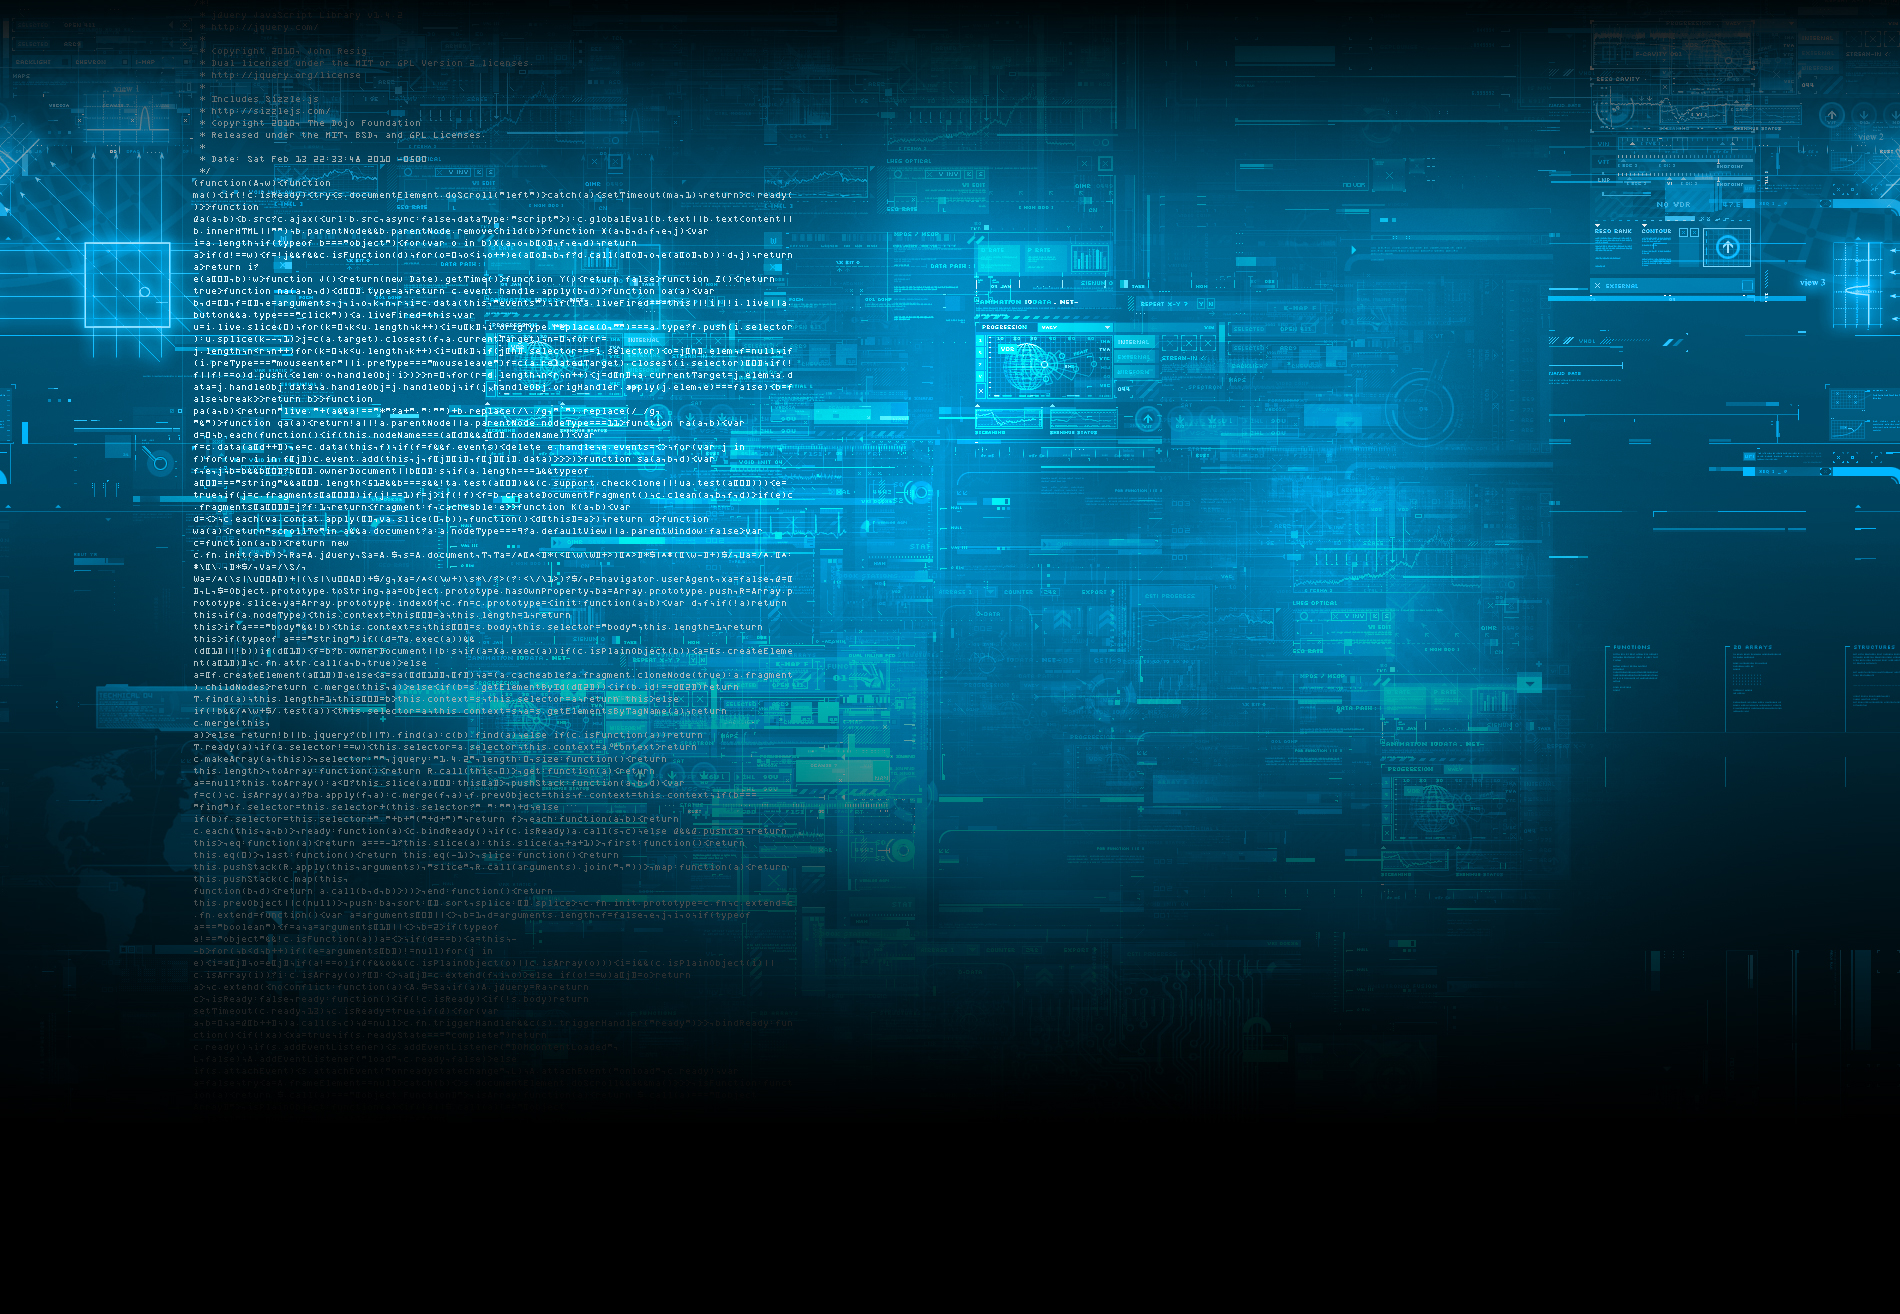 45 Hi Tech Wallpapers For Desktop and Laptops. Tech Wallpapers   WallpaperSafari